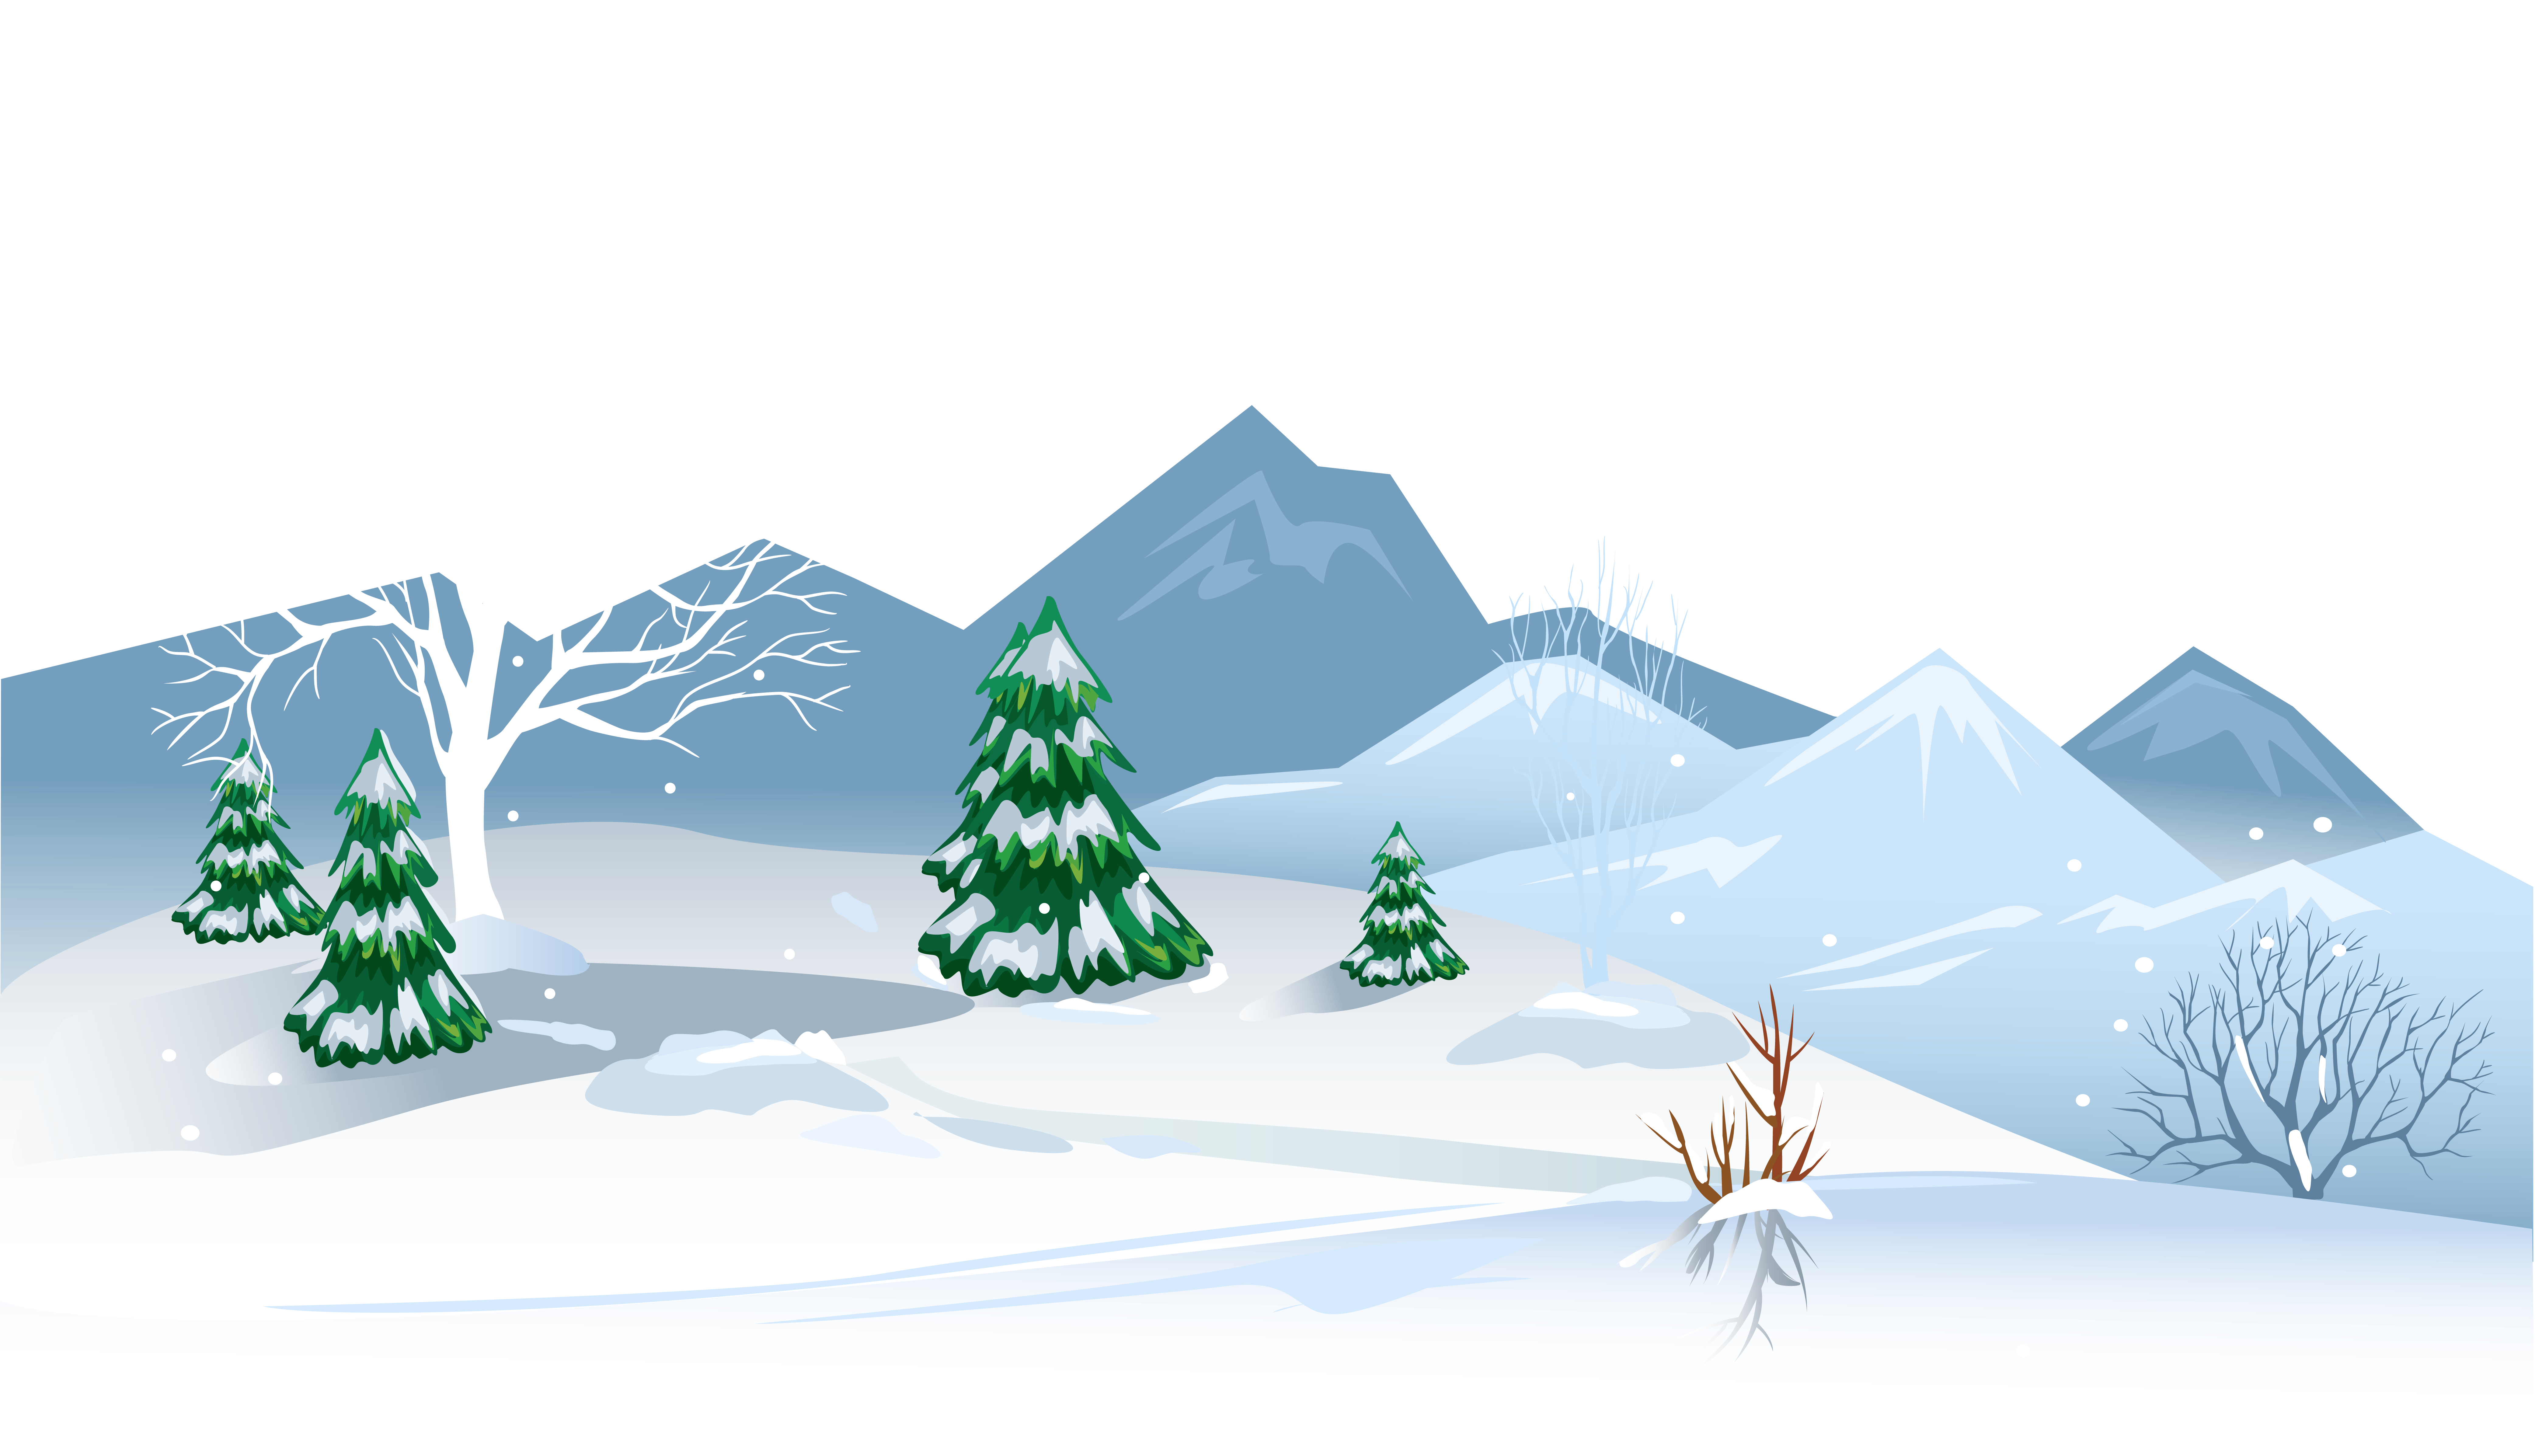 Snowfall clipart winter game #1